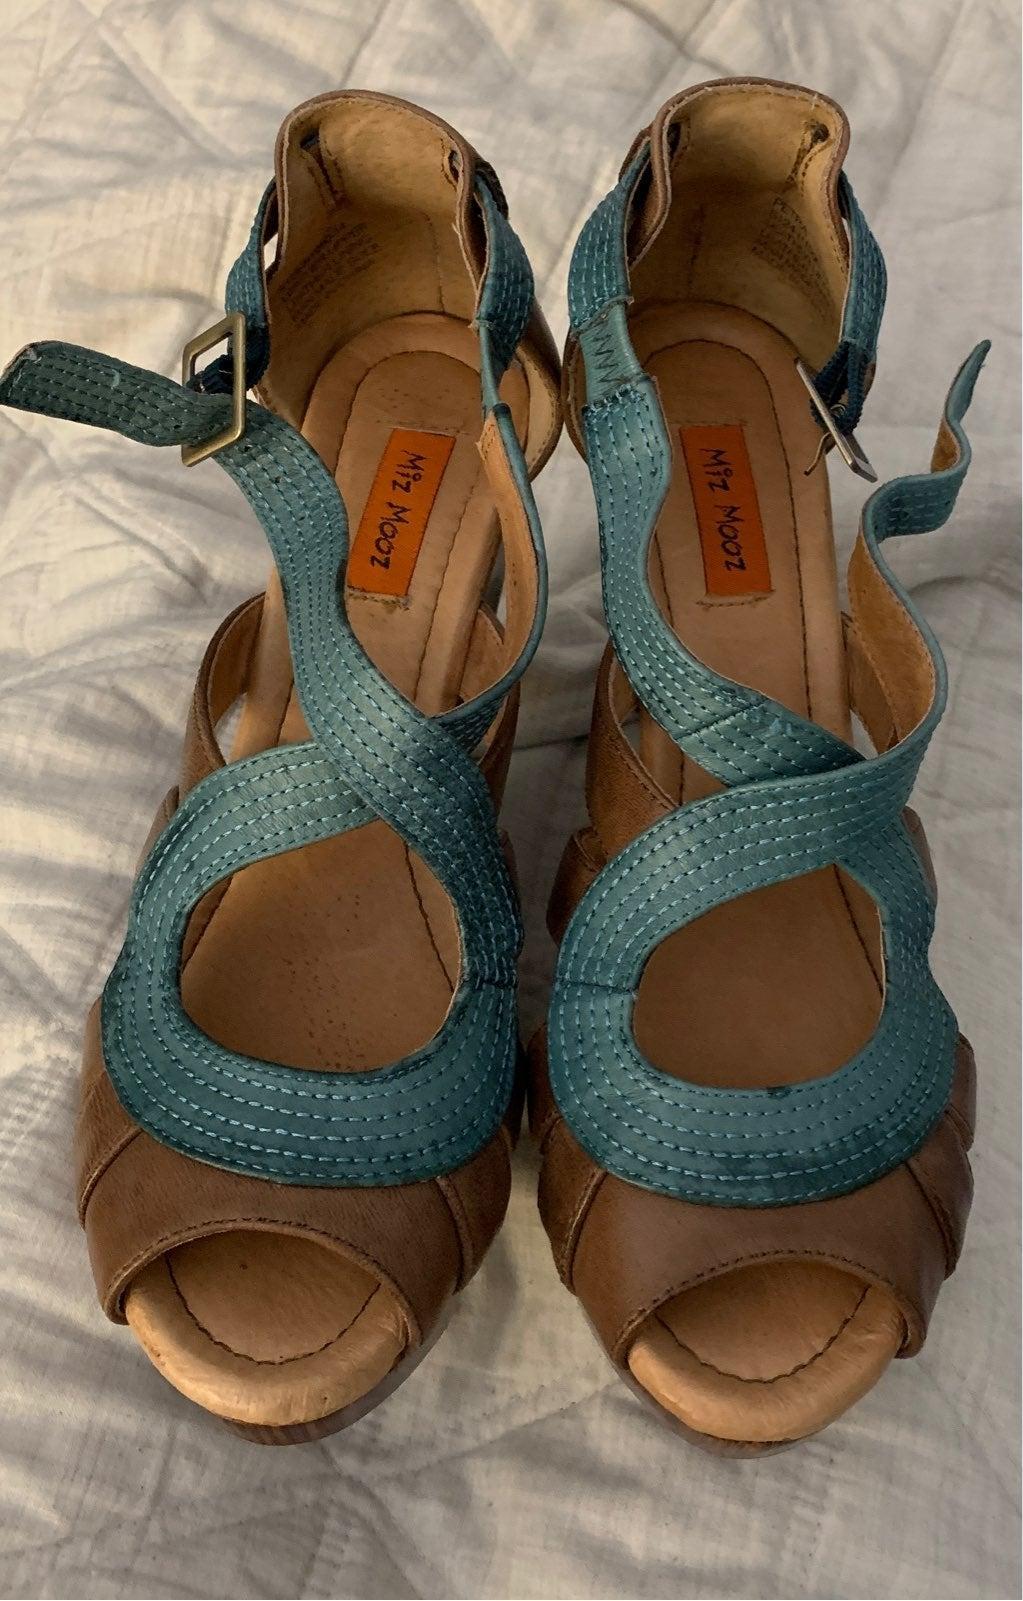 Miz mooz Petra wedge sandals